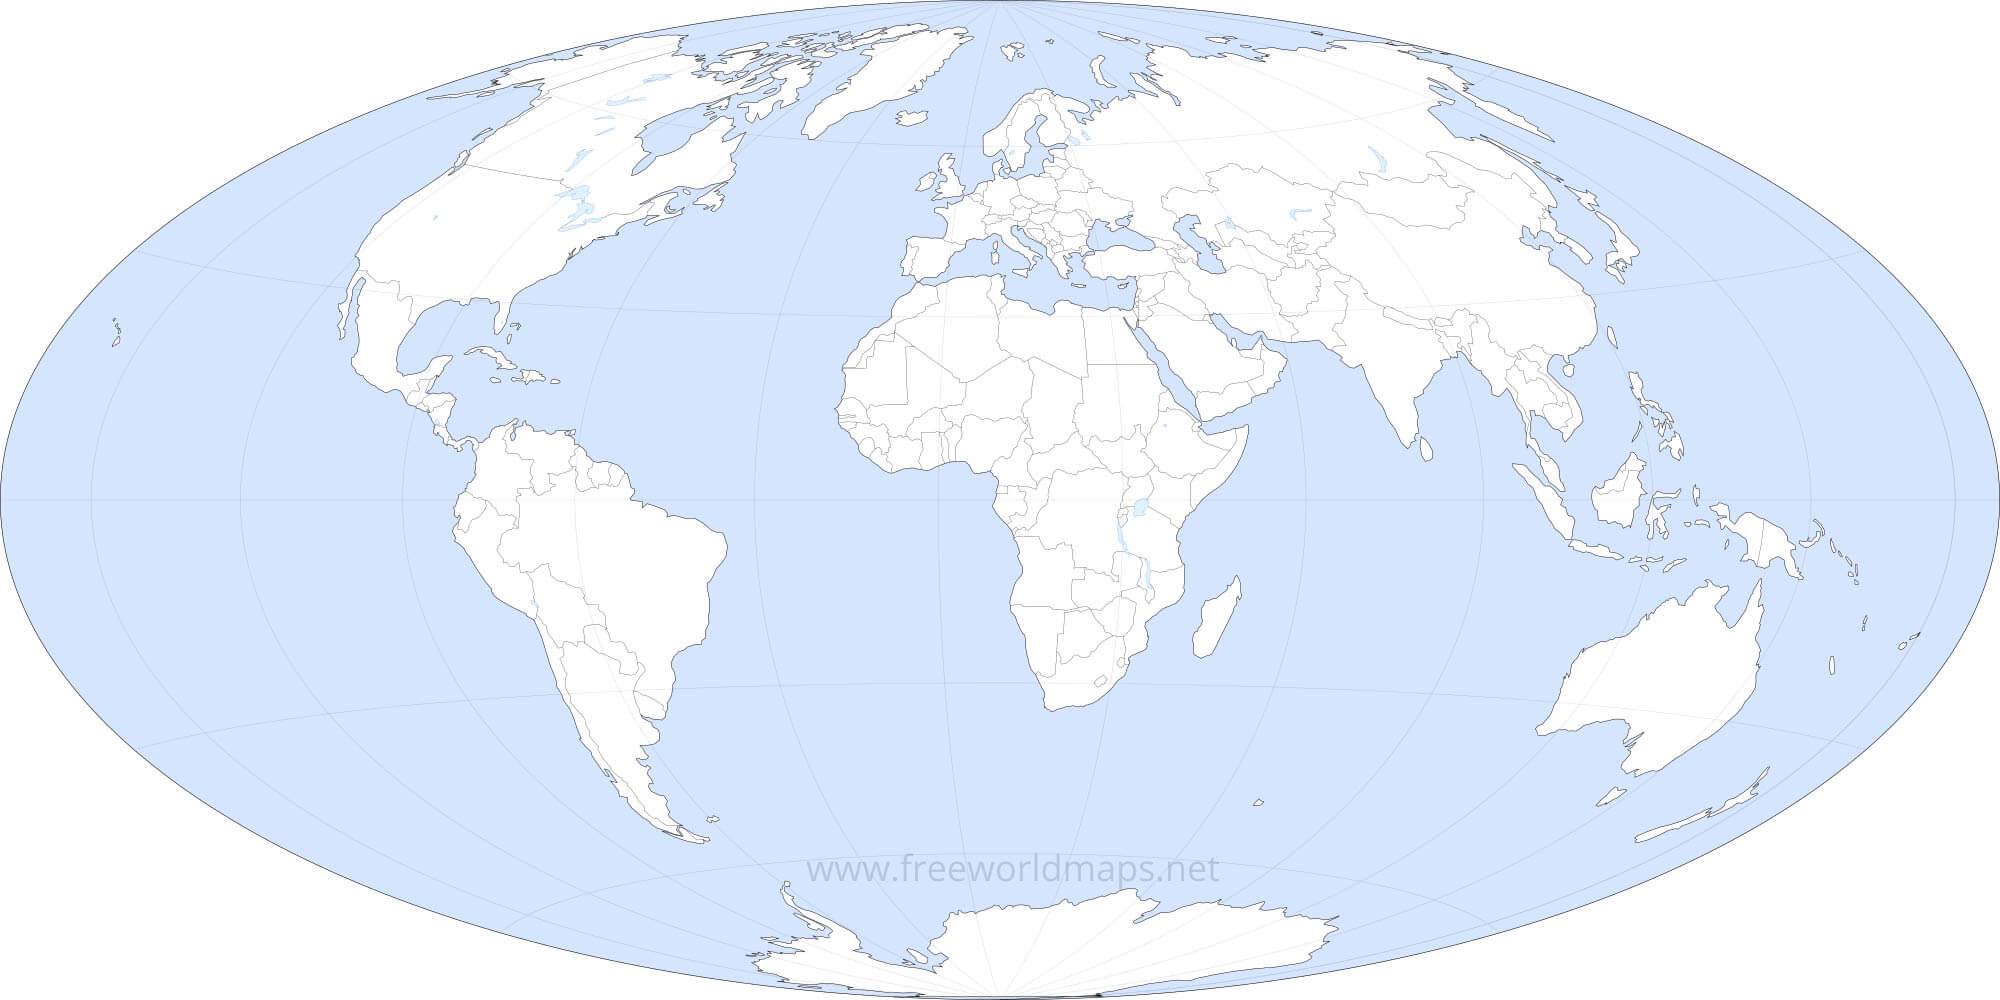 Free Printable World Maps